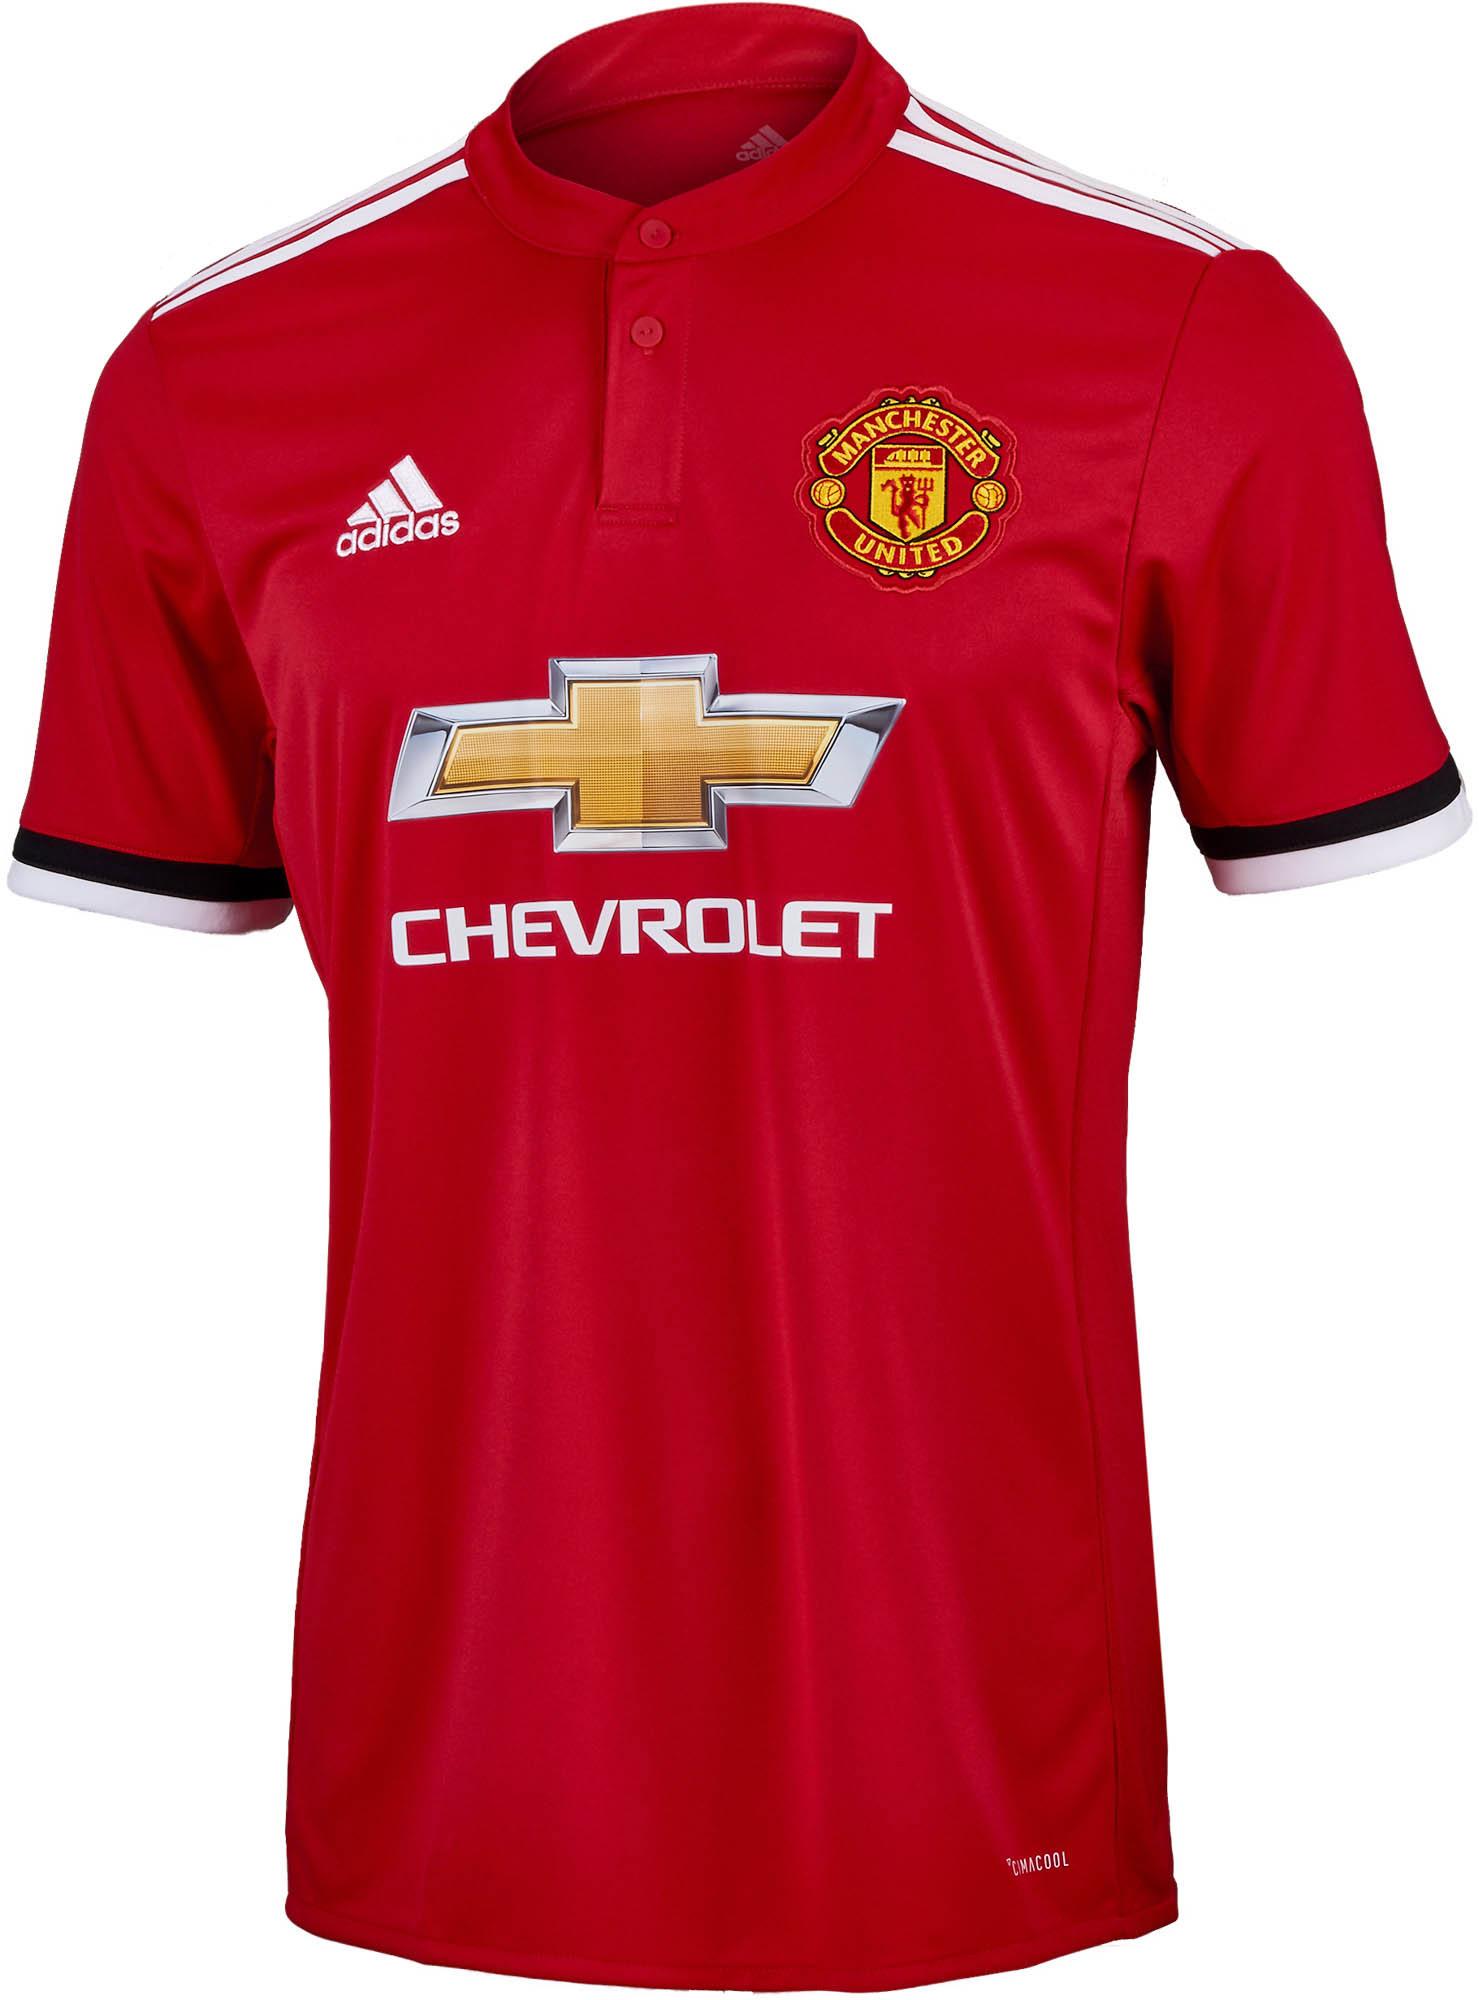 deaa3fd1440 2017/18 adidas Manchester United Home Jersey - Soccer Master